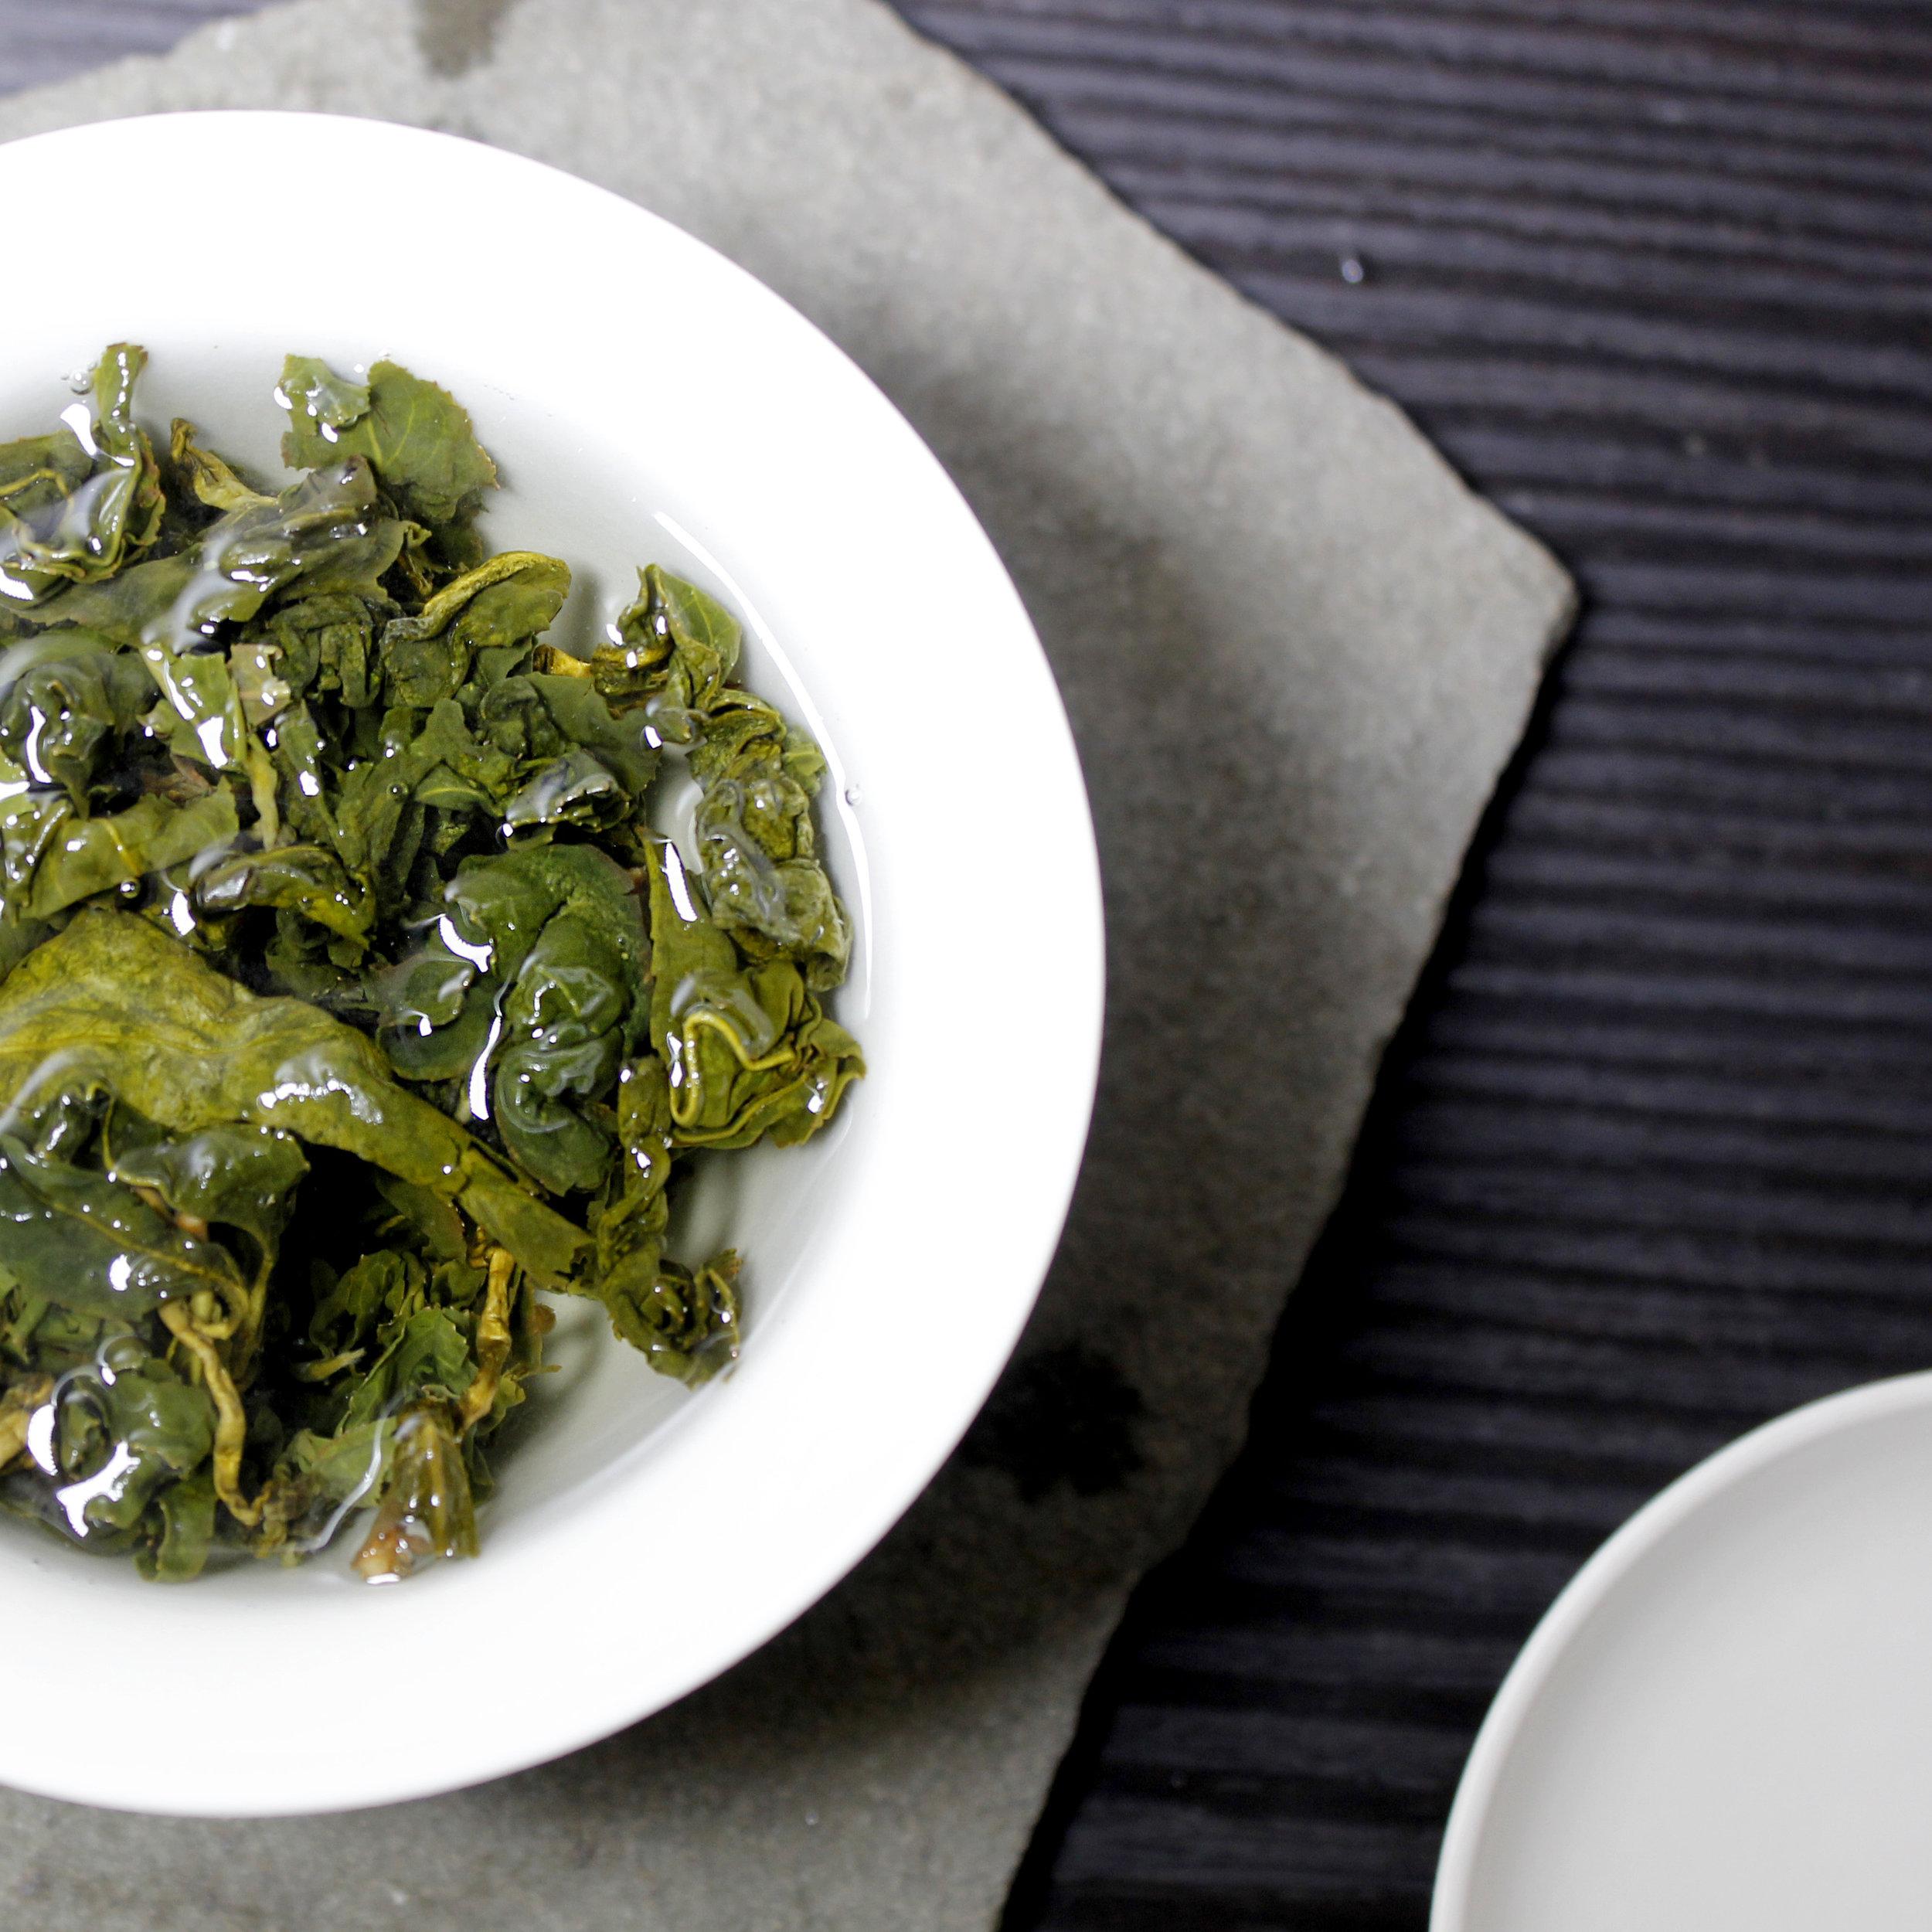 shan-lin-xi-oolong-whole-leaf-loose-tea-itw2-2019a.jpg